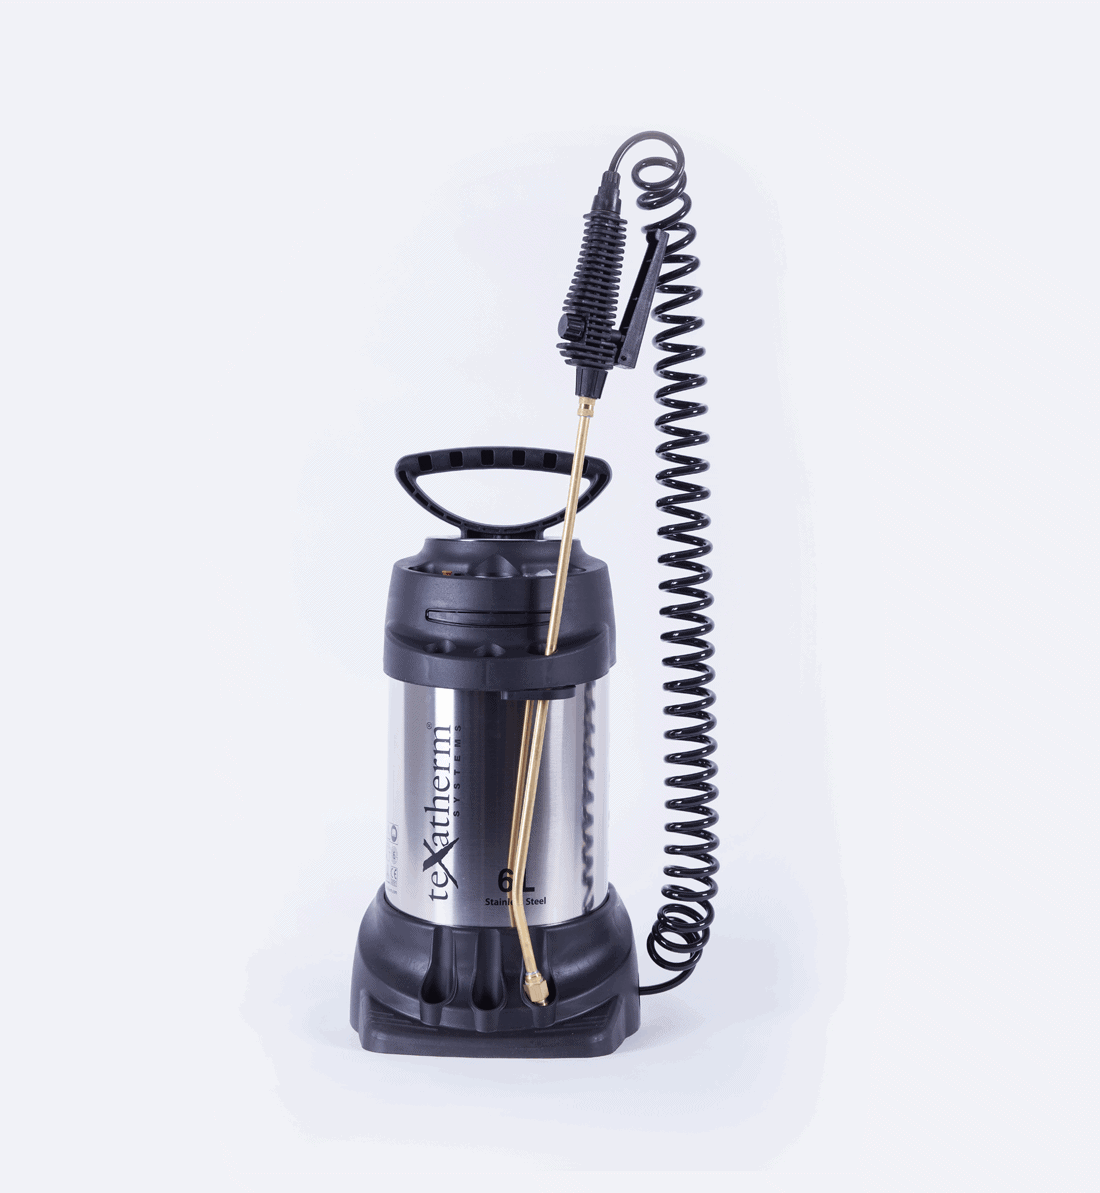 Texatherm-6ltr-Sprayer-1.png